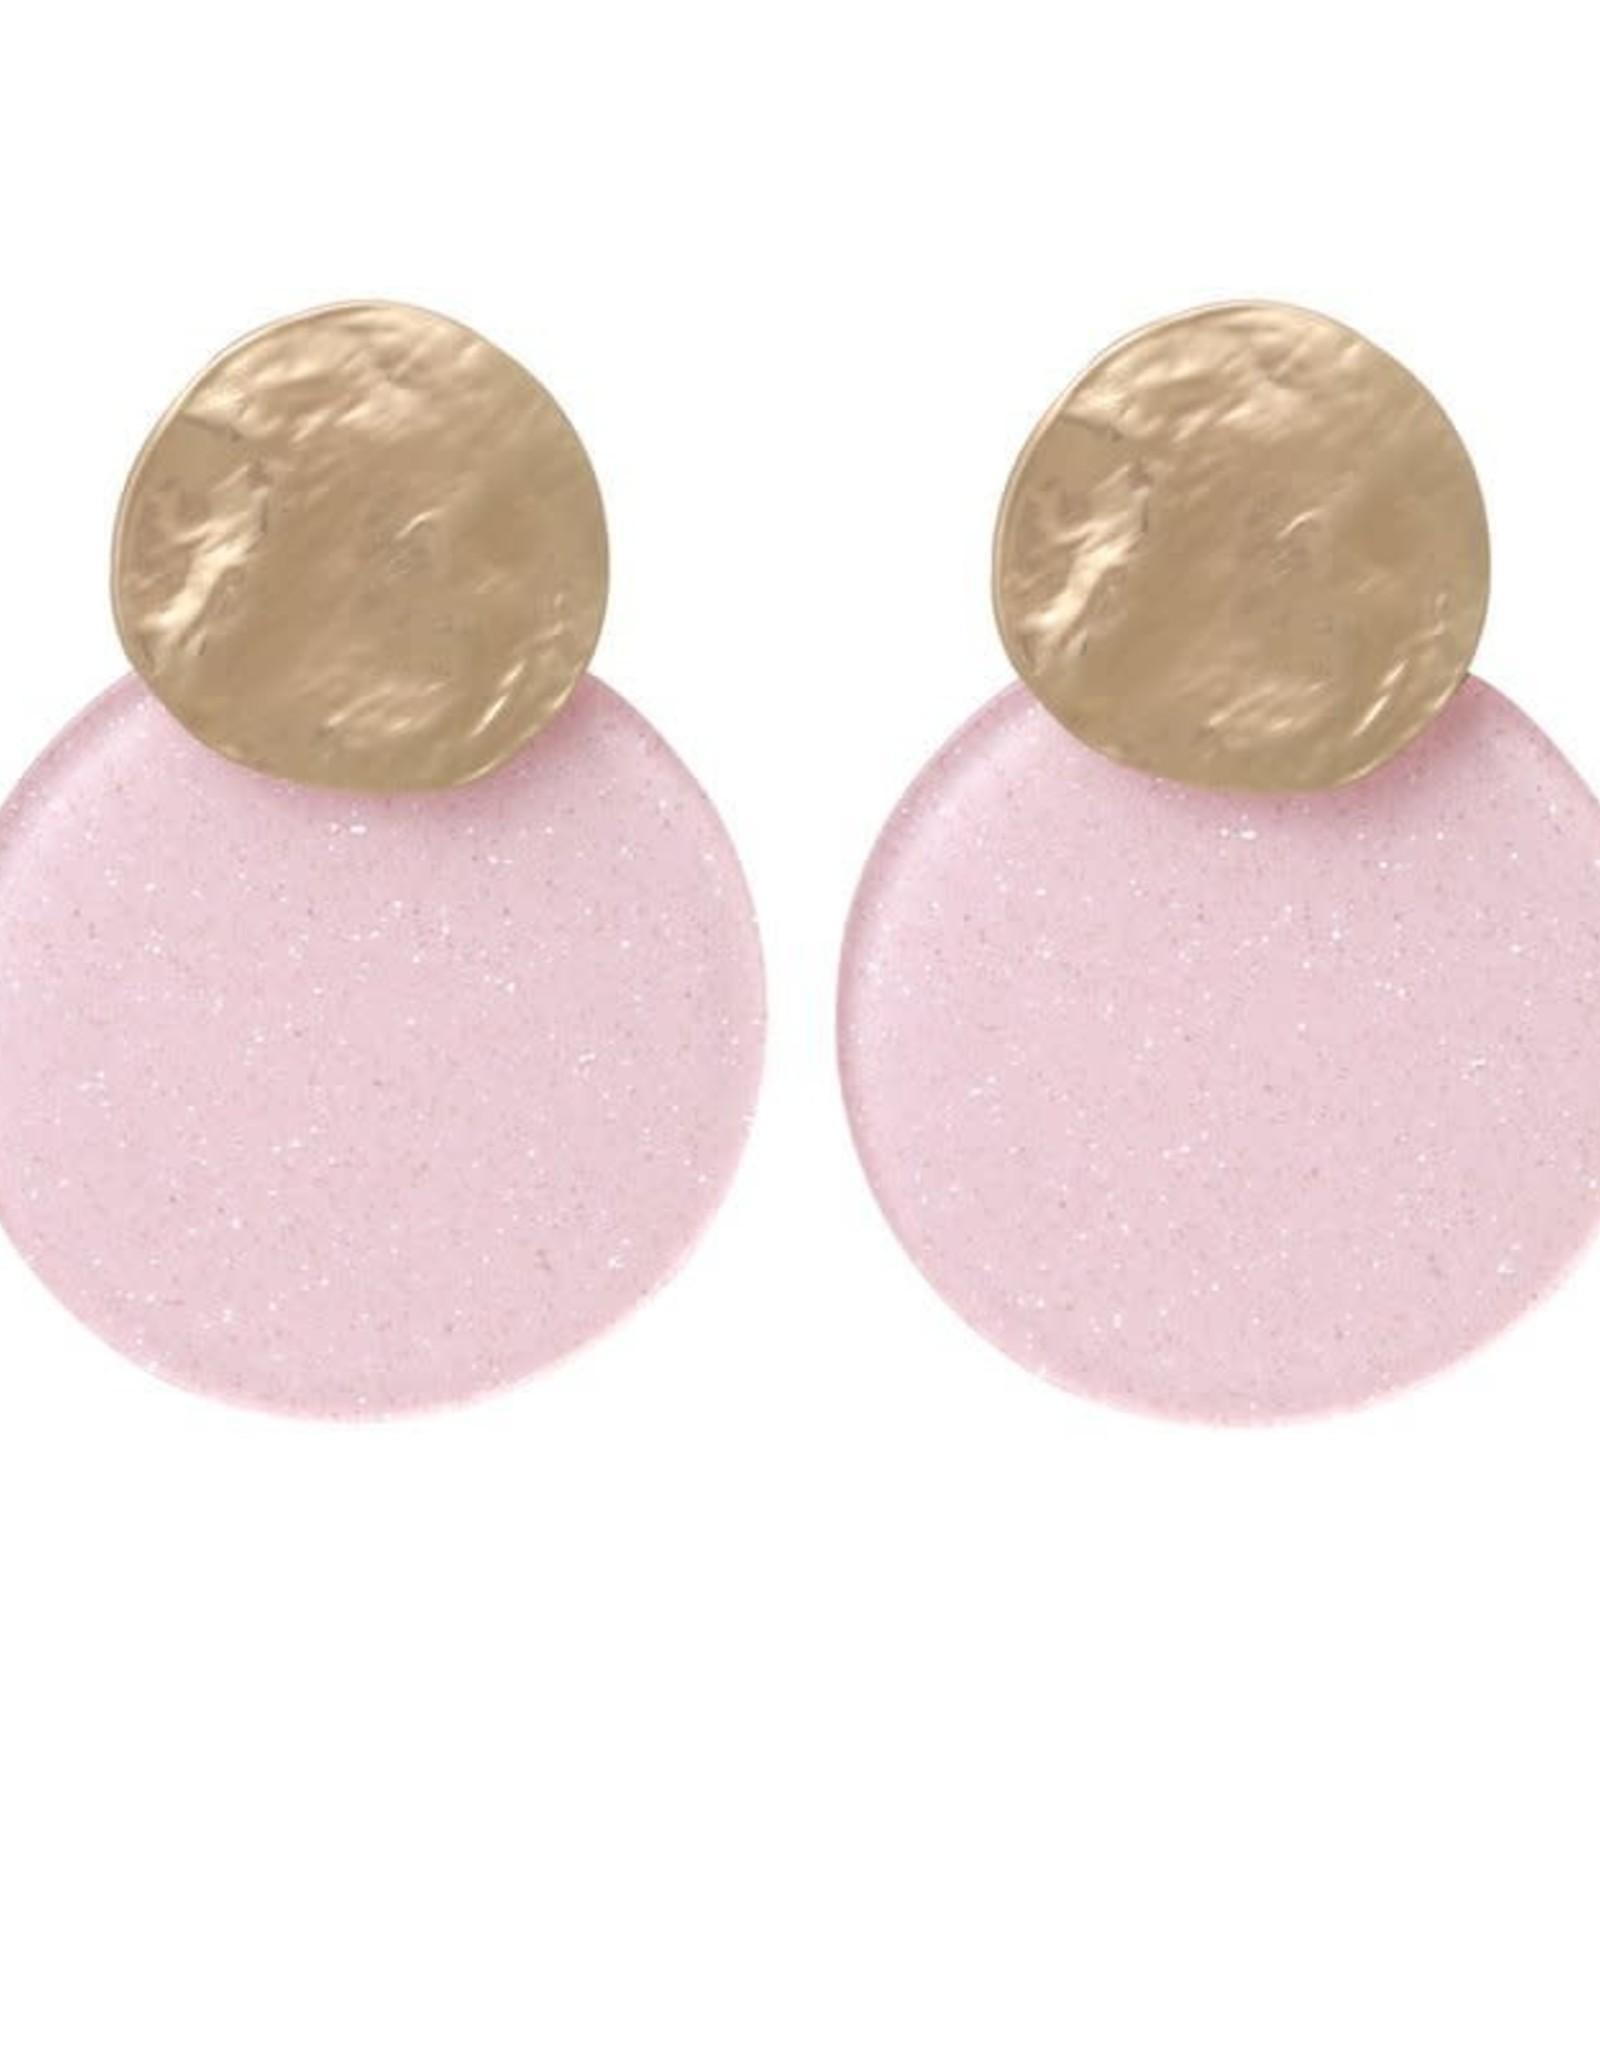 Biba Biba oorbellen cirkel licht roze